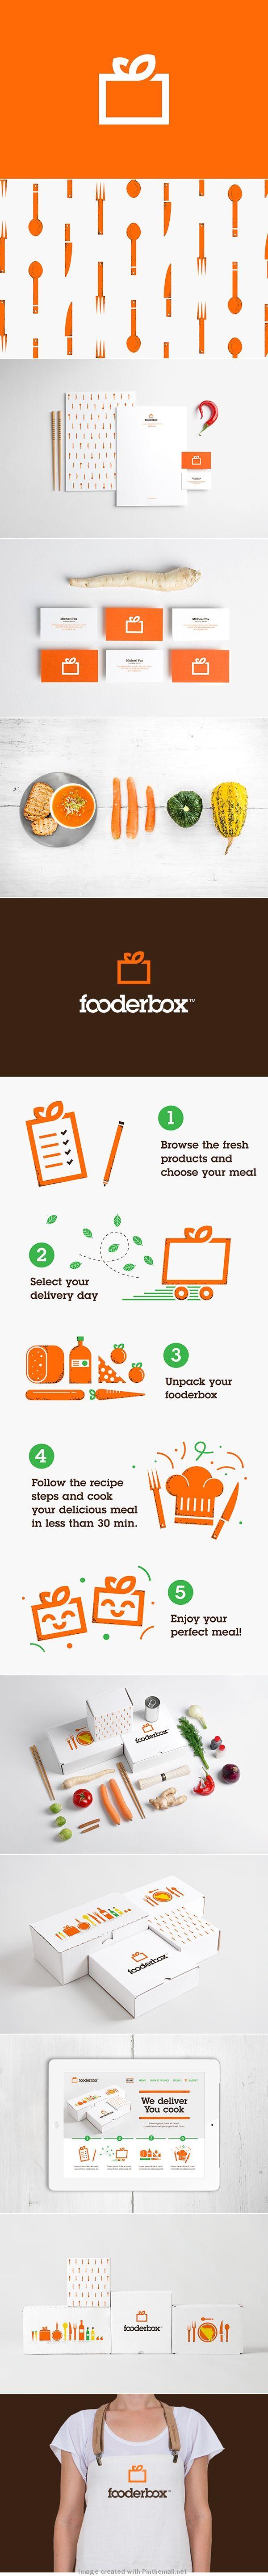 Fooder box #identity #packaging #branding PD